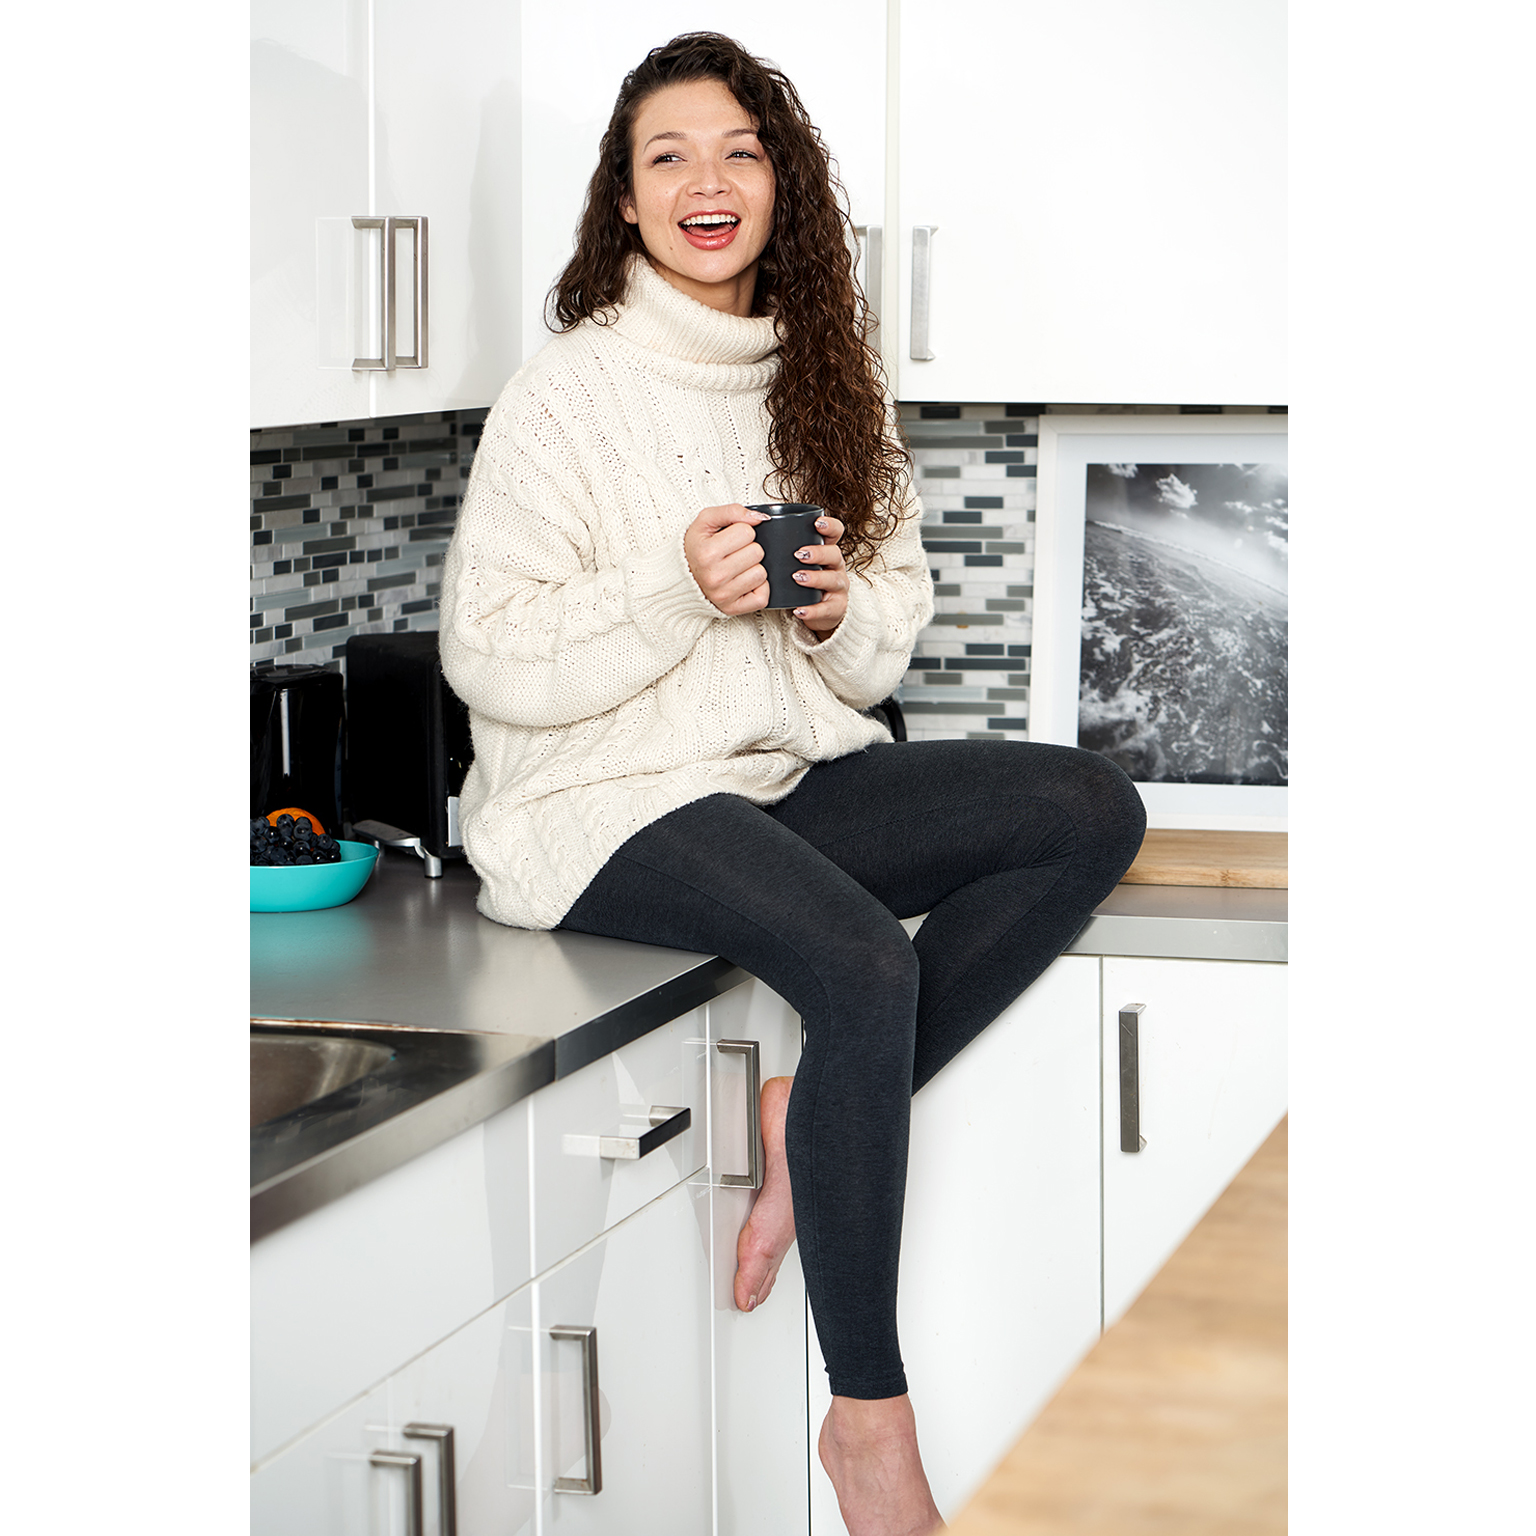 Toronto-Fitness-Model-Agency-Lifestyle-Lauren-Lyn